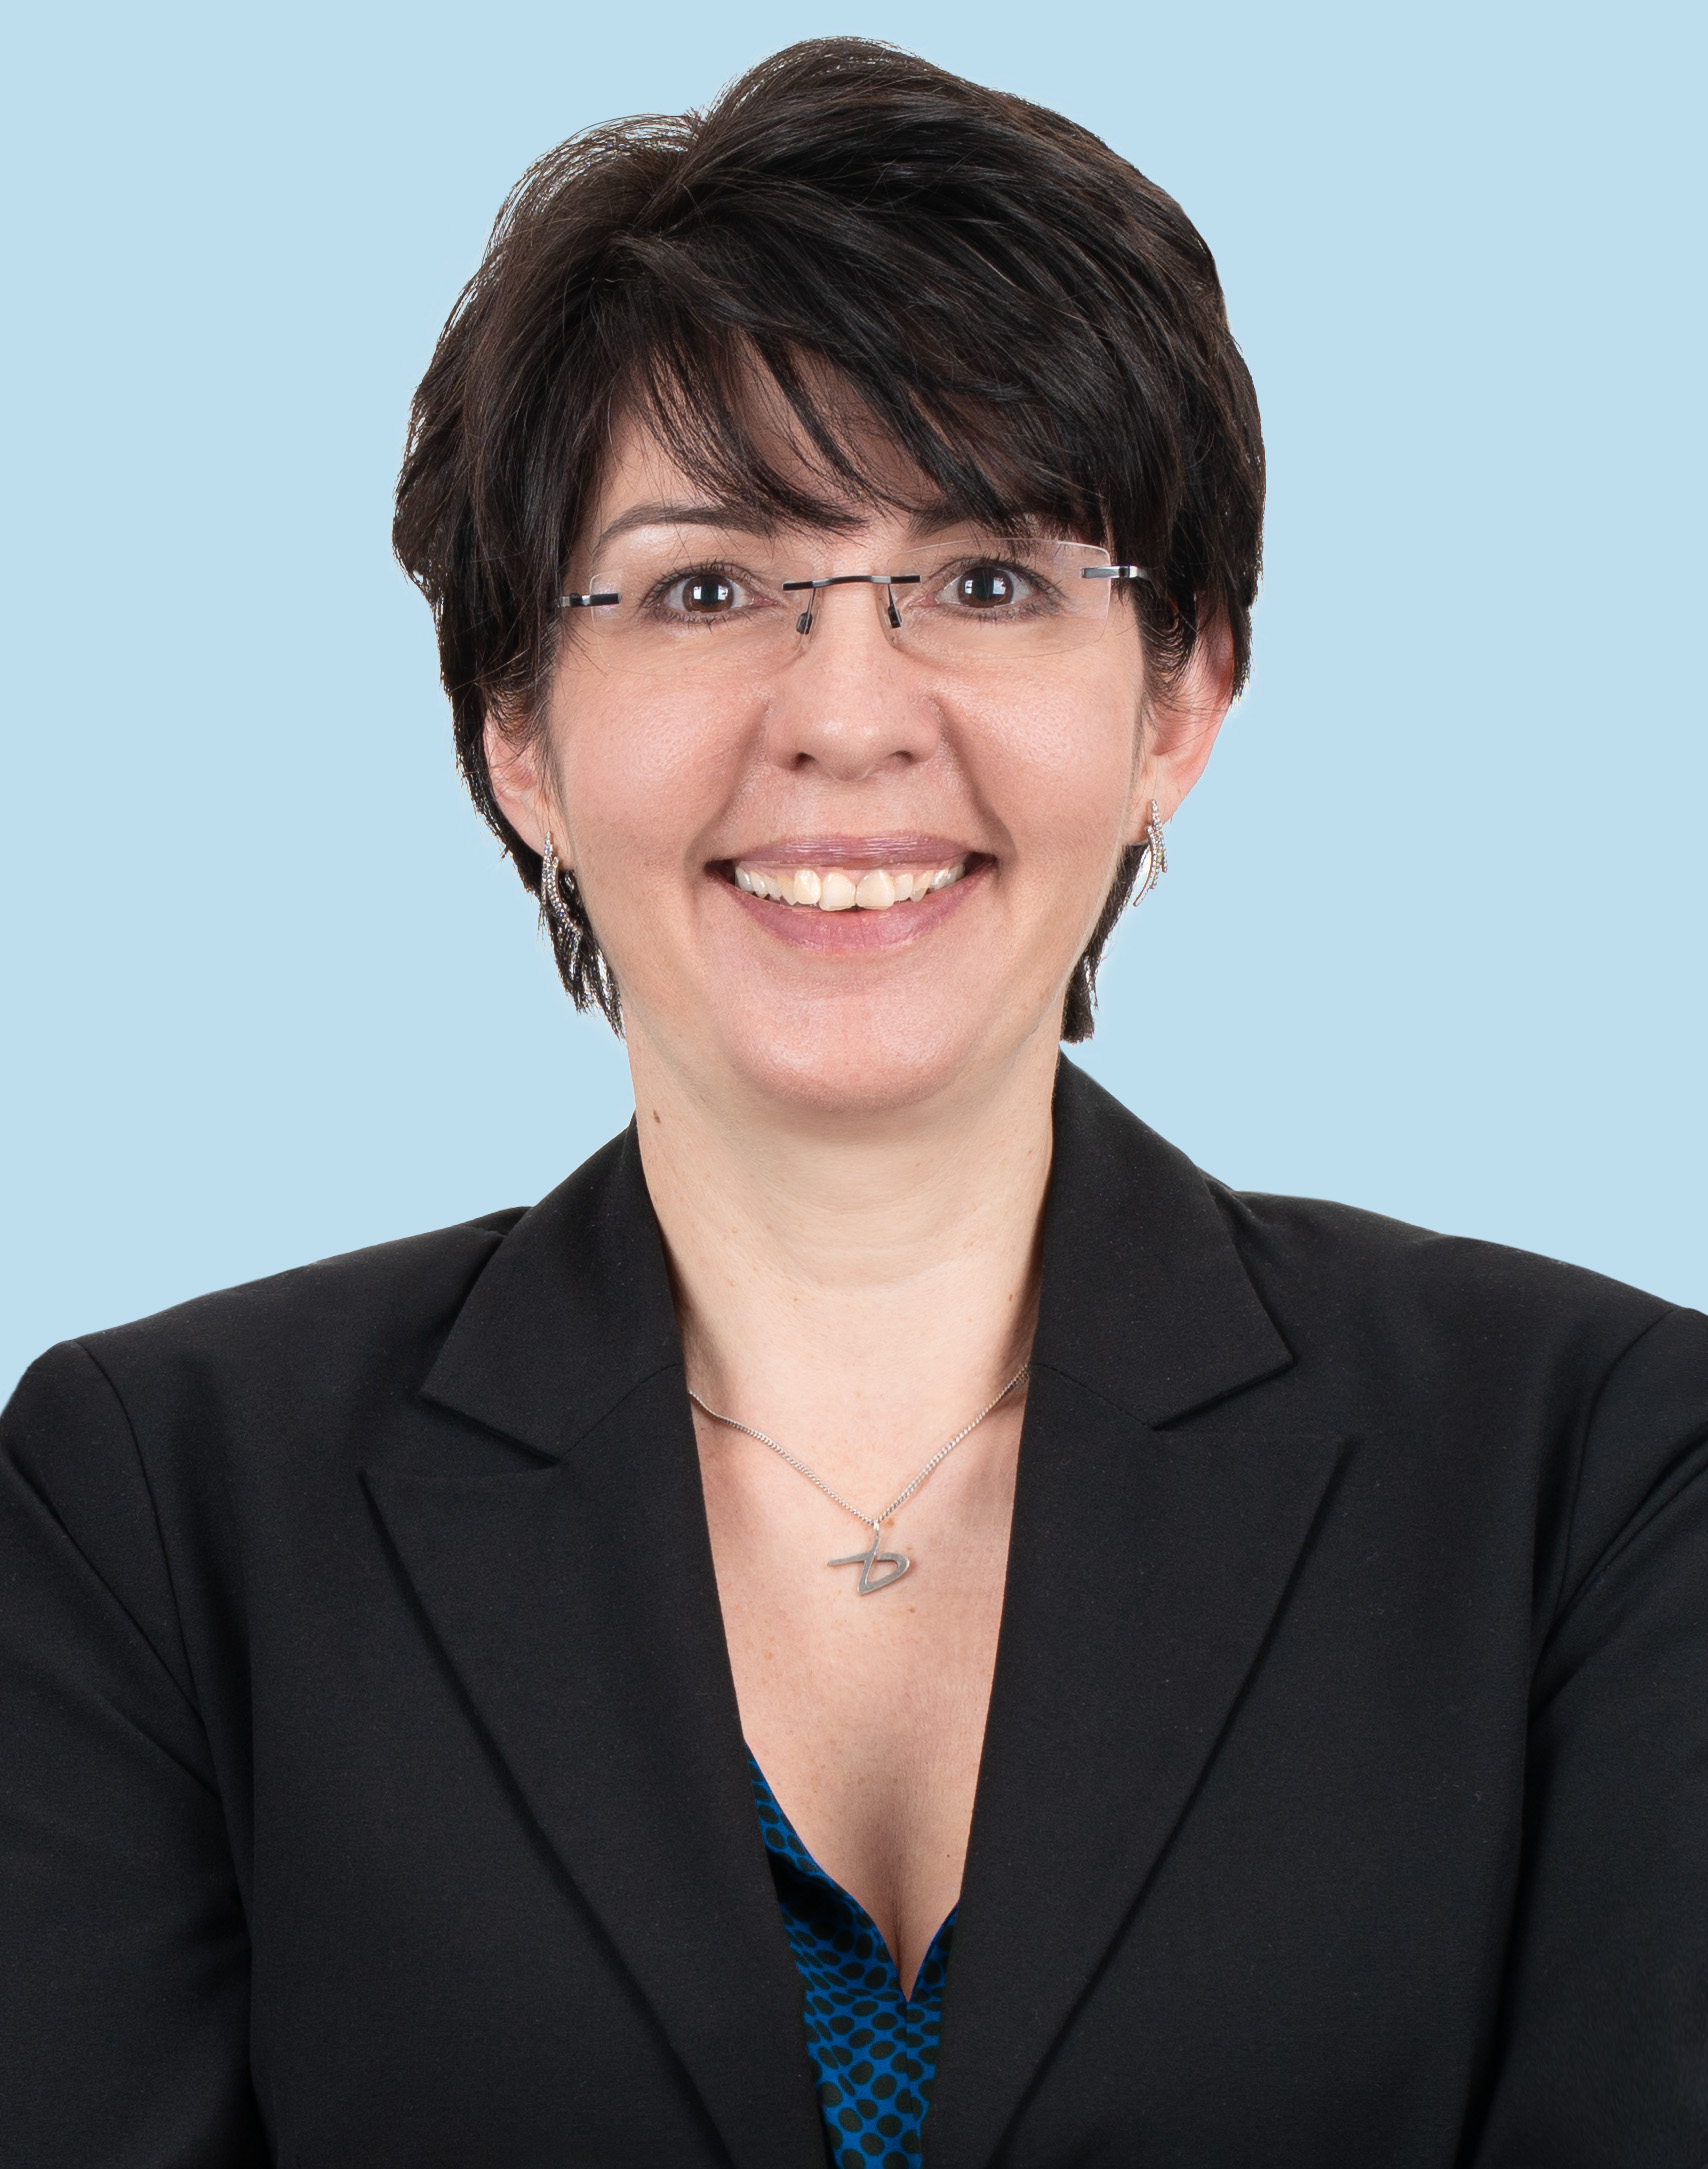 Passbild Frau Tatjana Dujmic